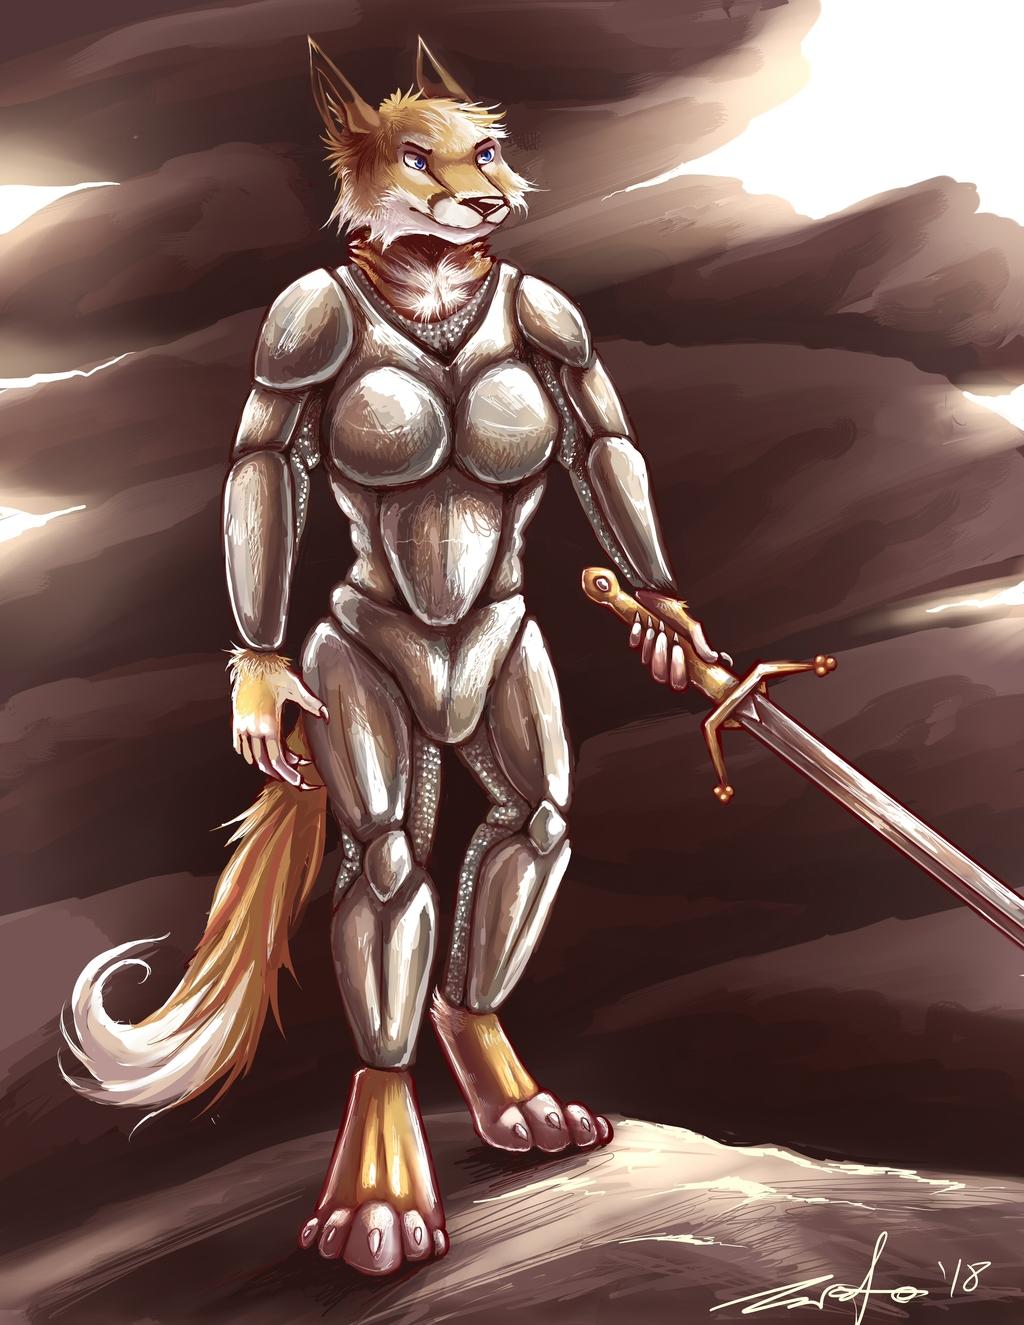 Fox in armor